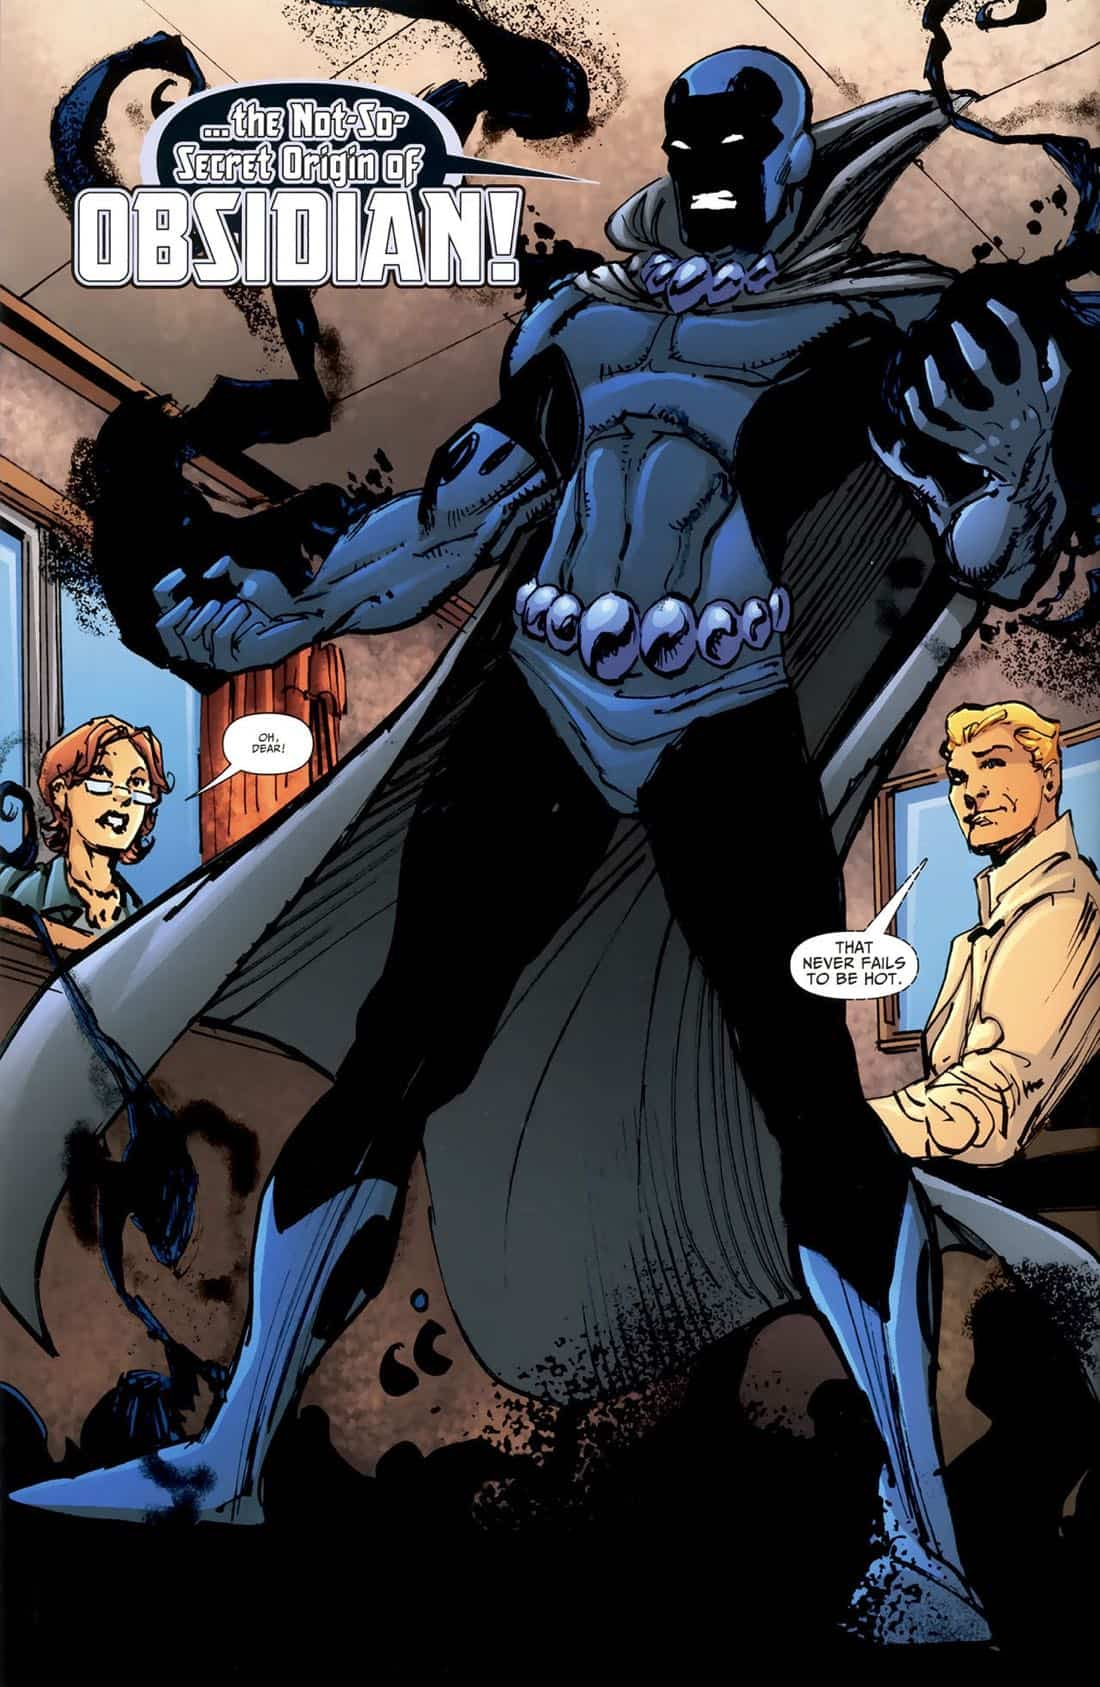 DC Character Art--Obsidian